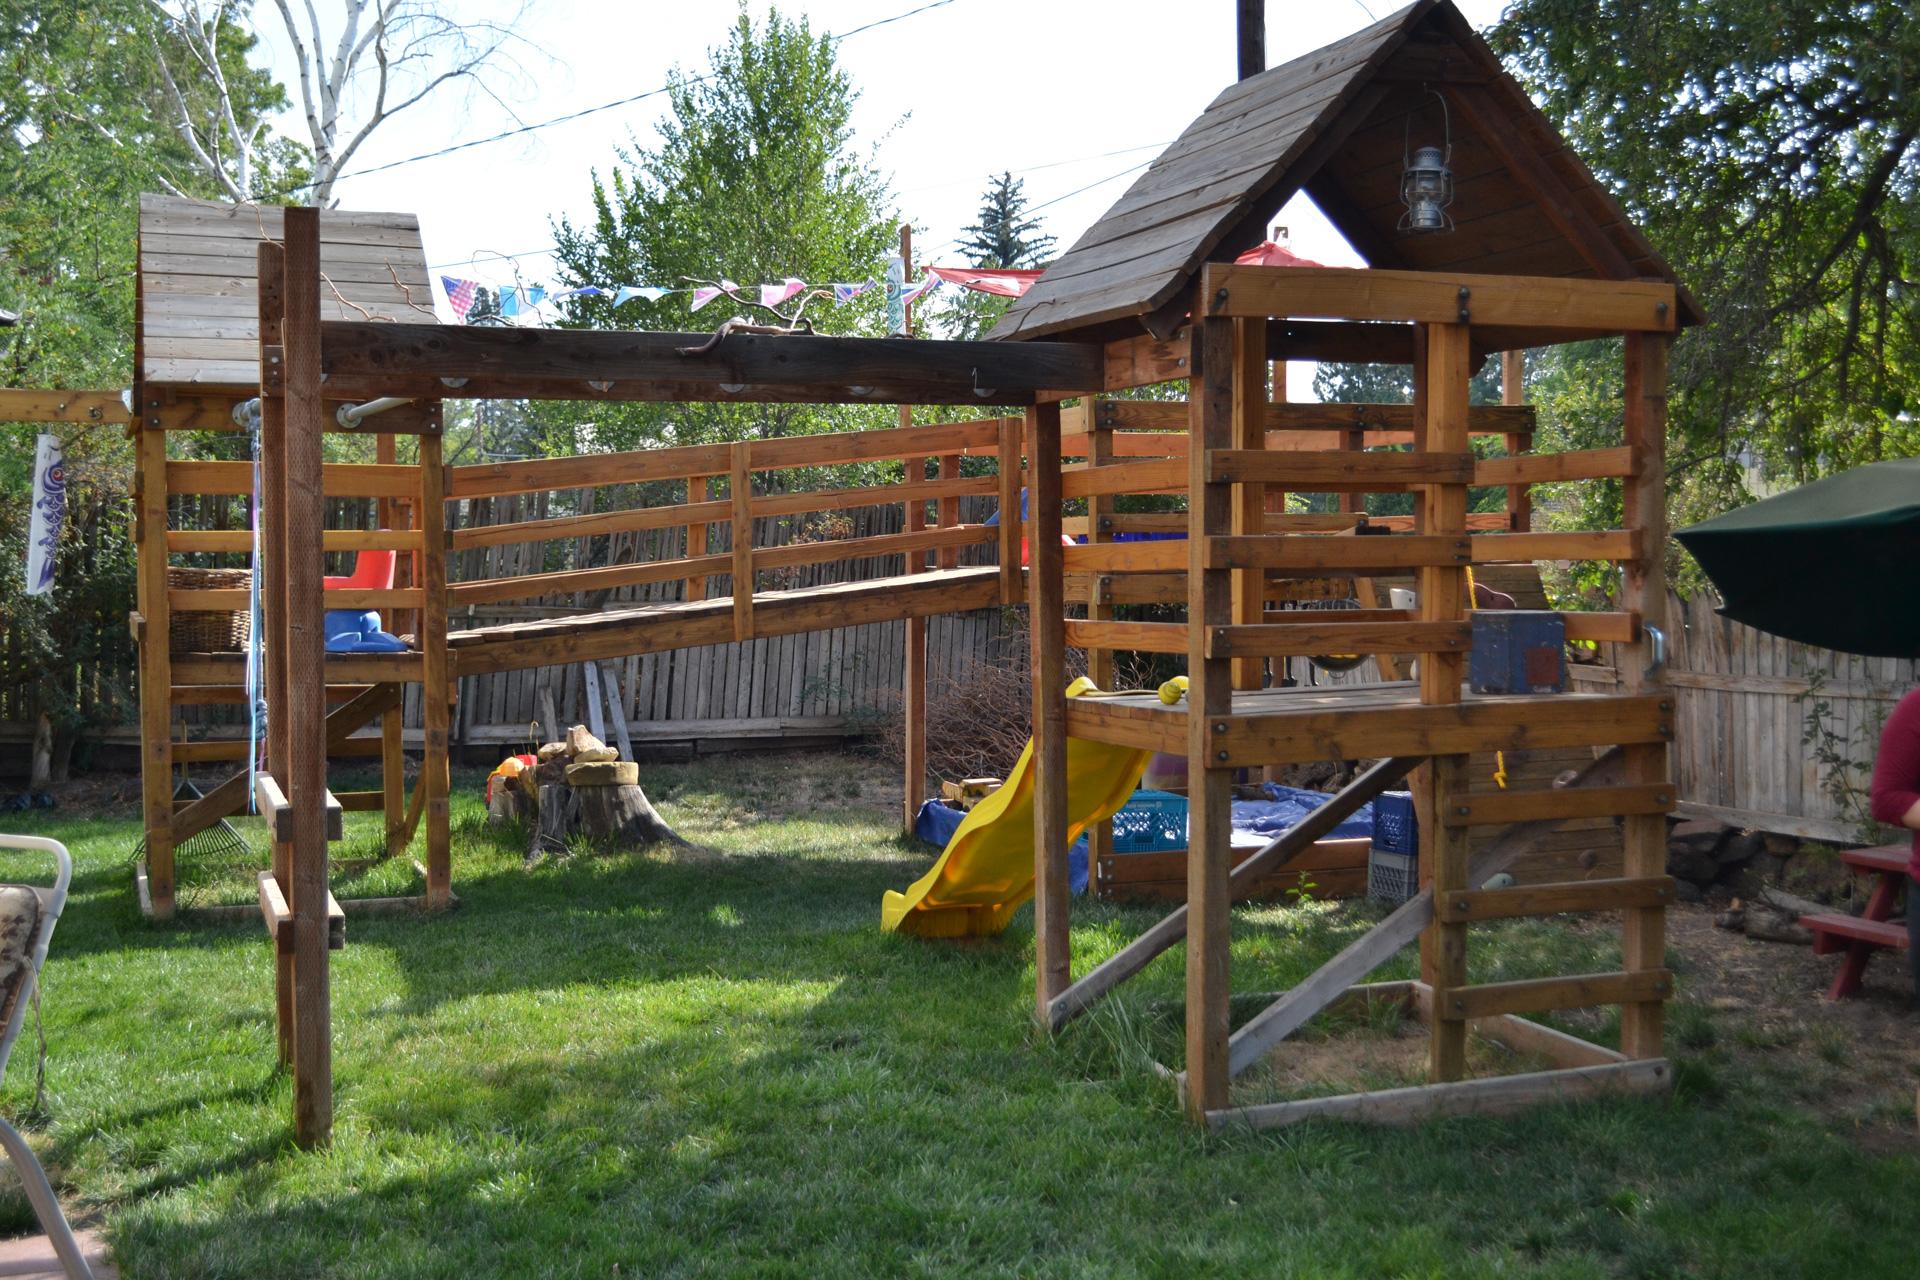 redmond preschools gallery redmond preschool kidinc 918